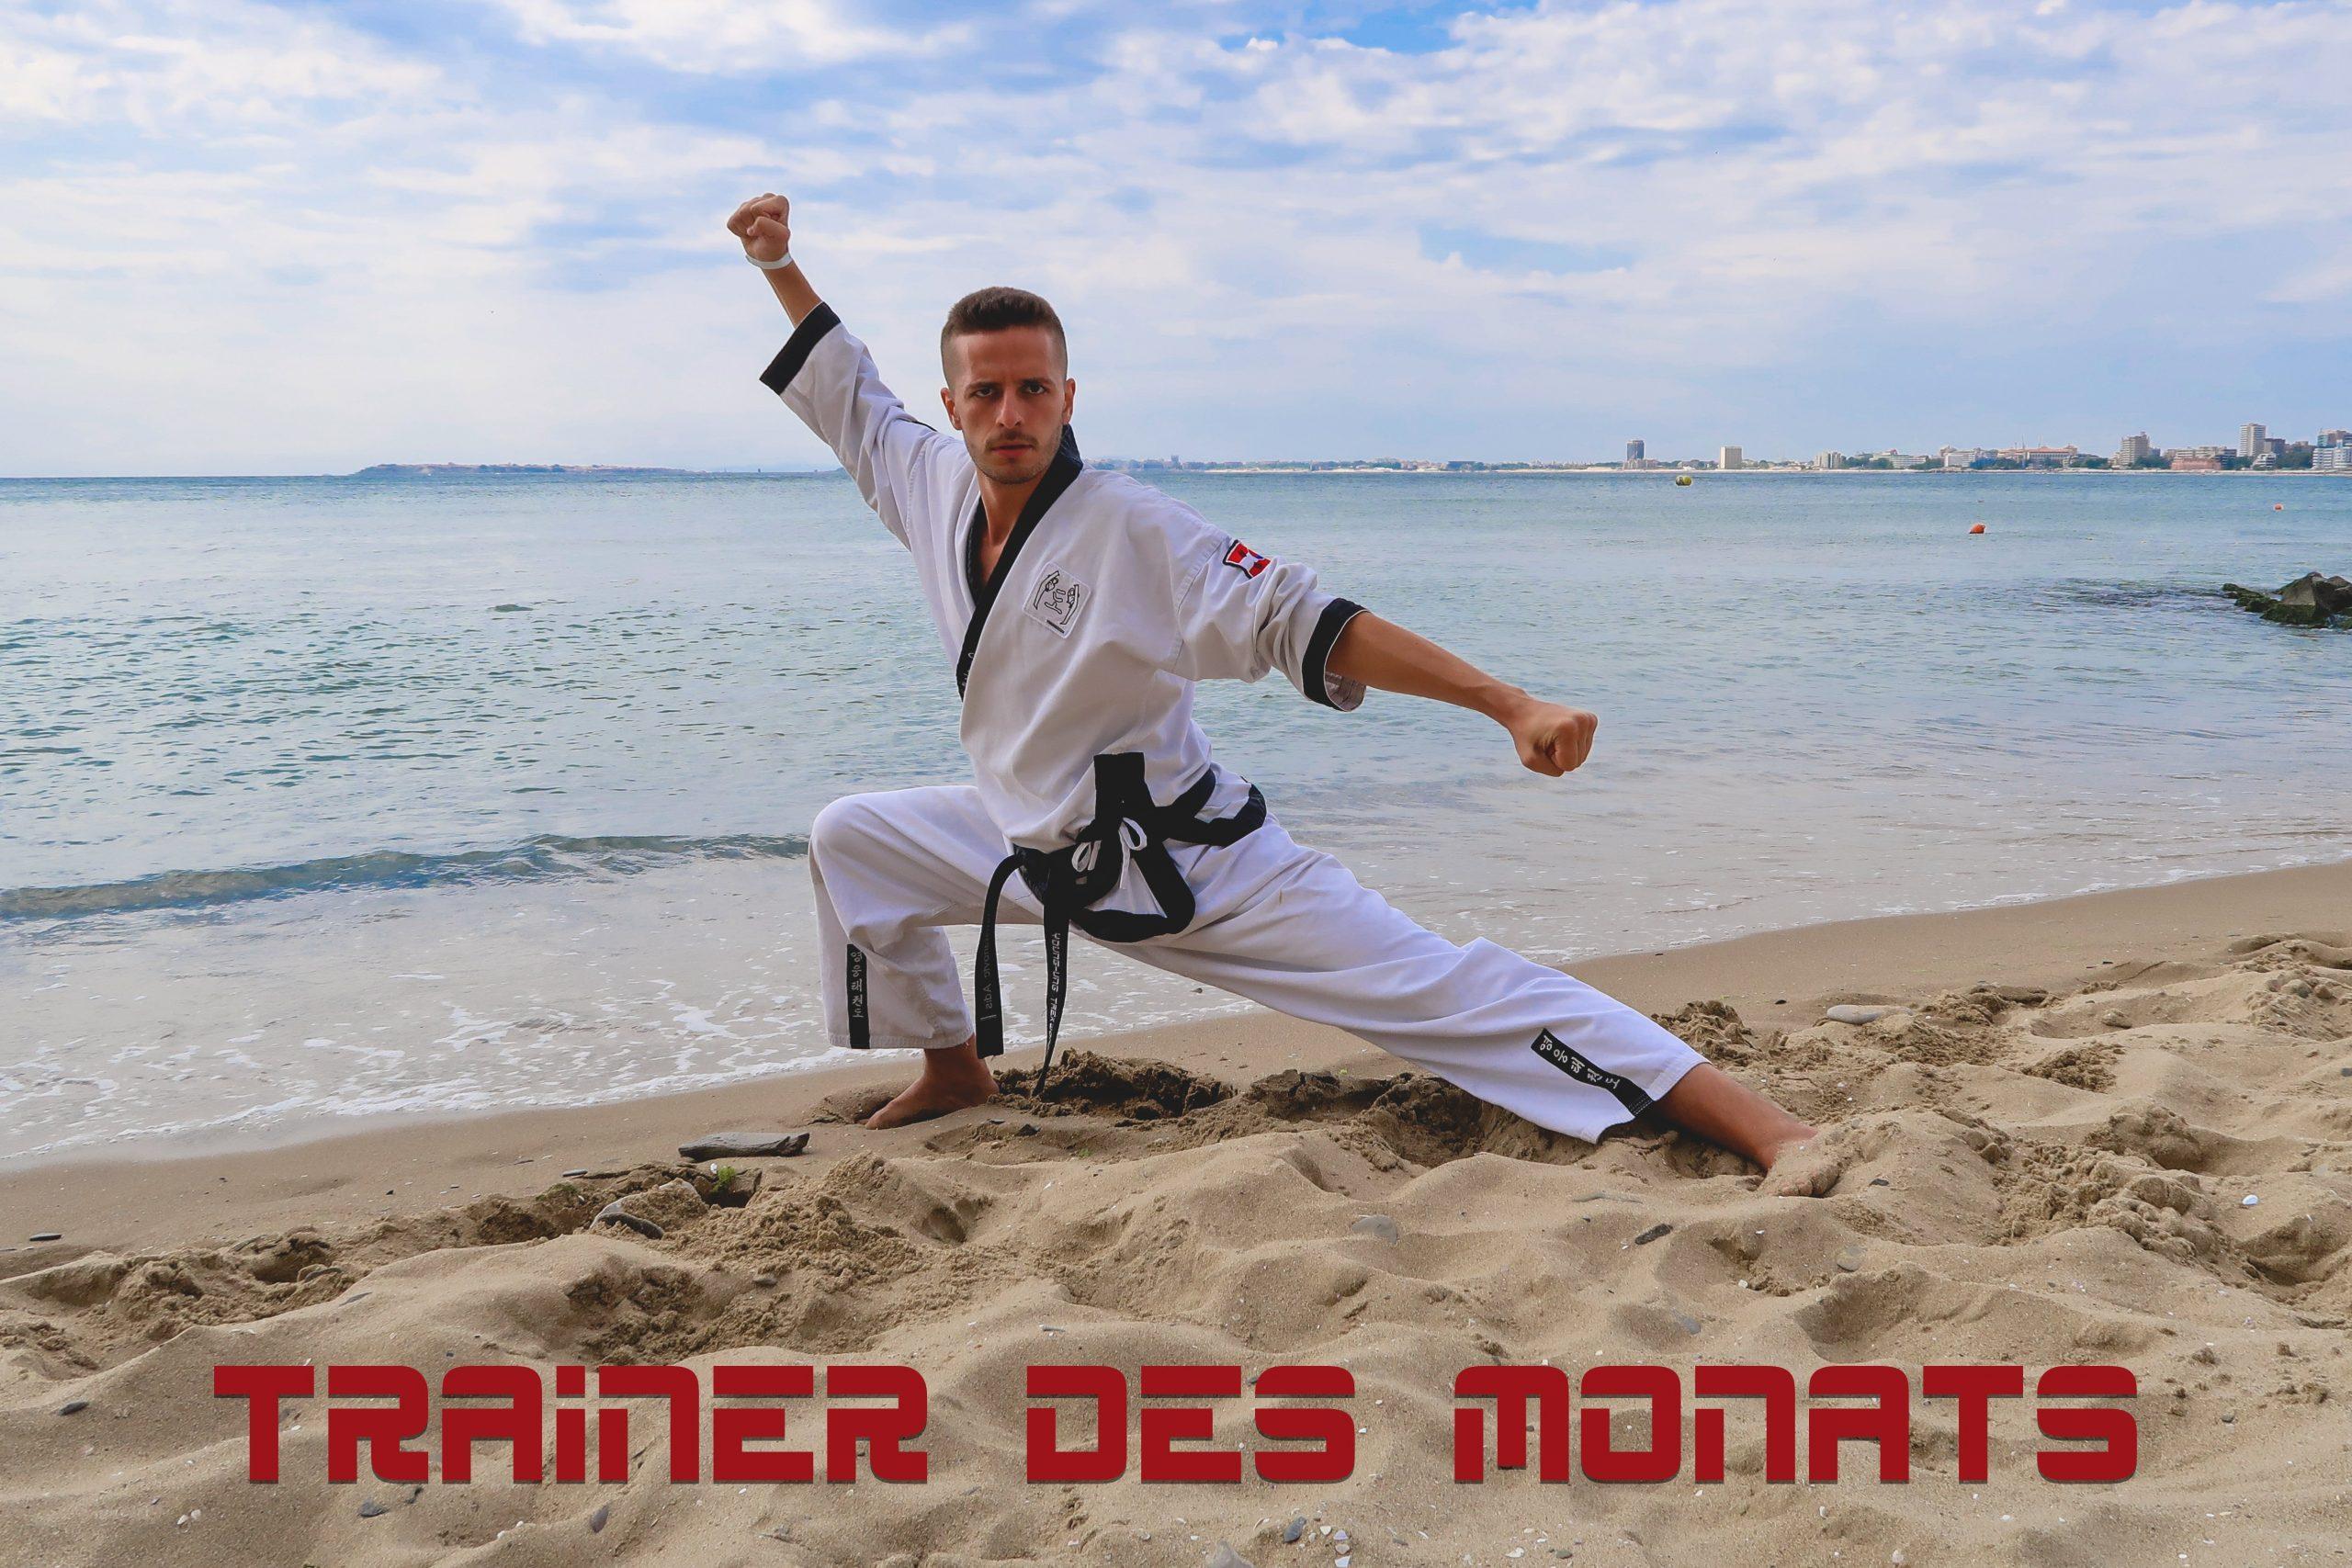 YOUNG-UNG Taekwondo Kampfsport Trainer des Monats